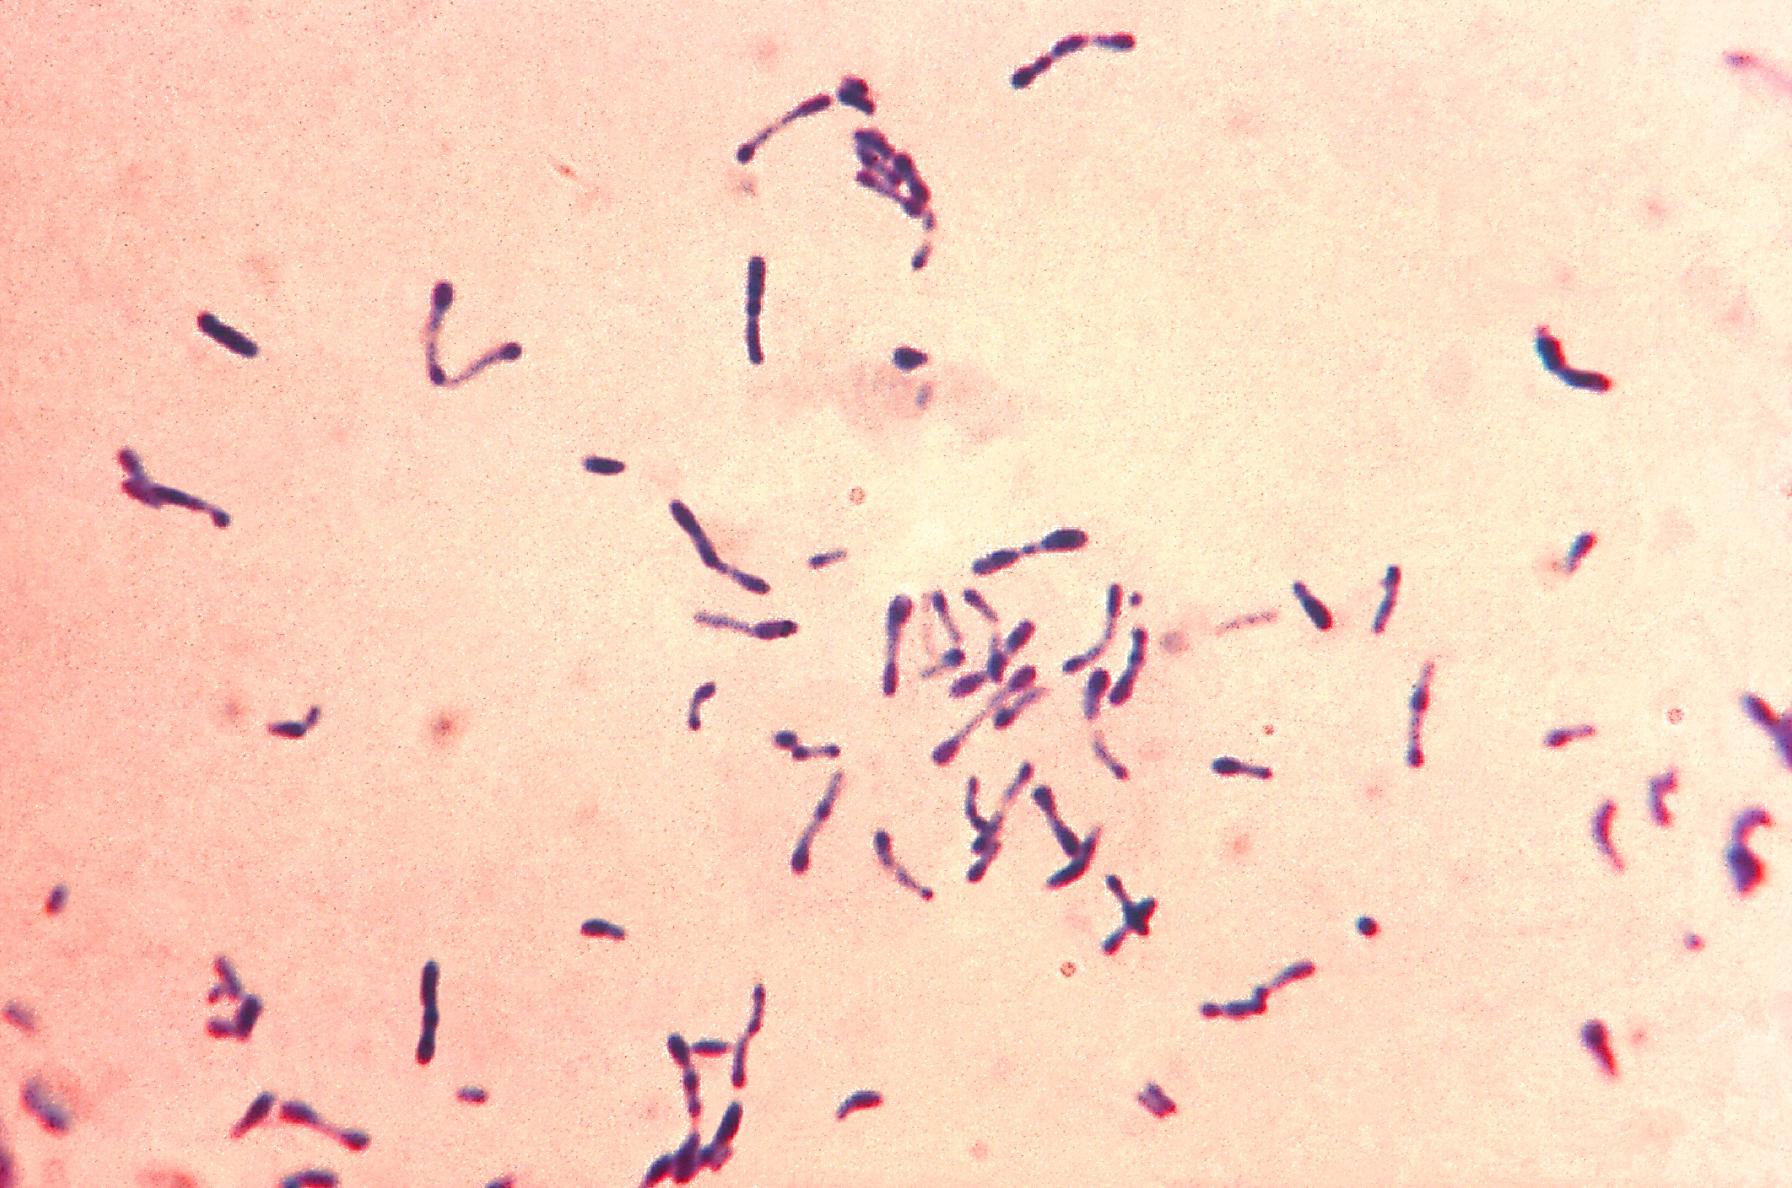 Caseous Lymphadenitis  Goats and Health  GOATWORLDCOM